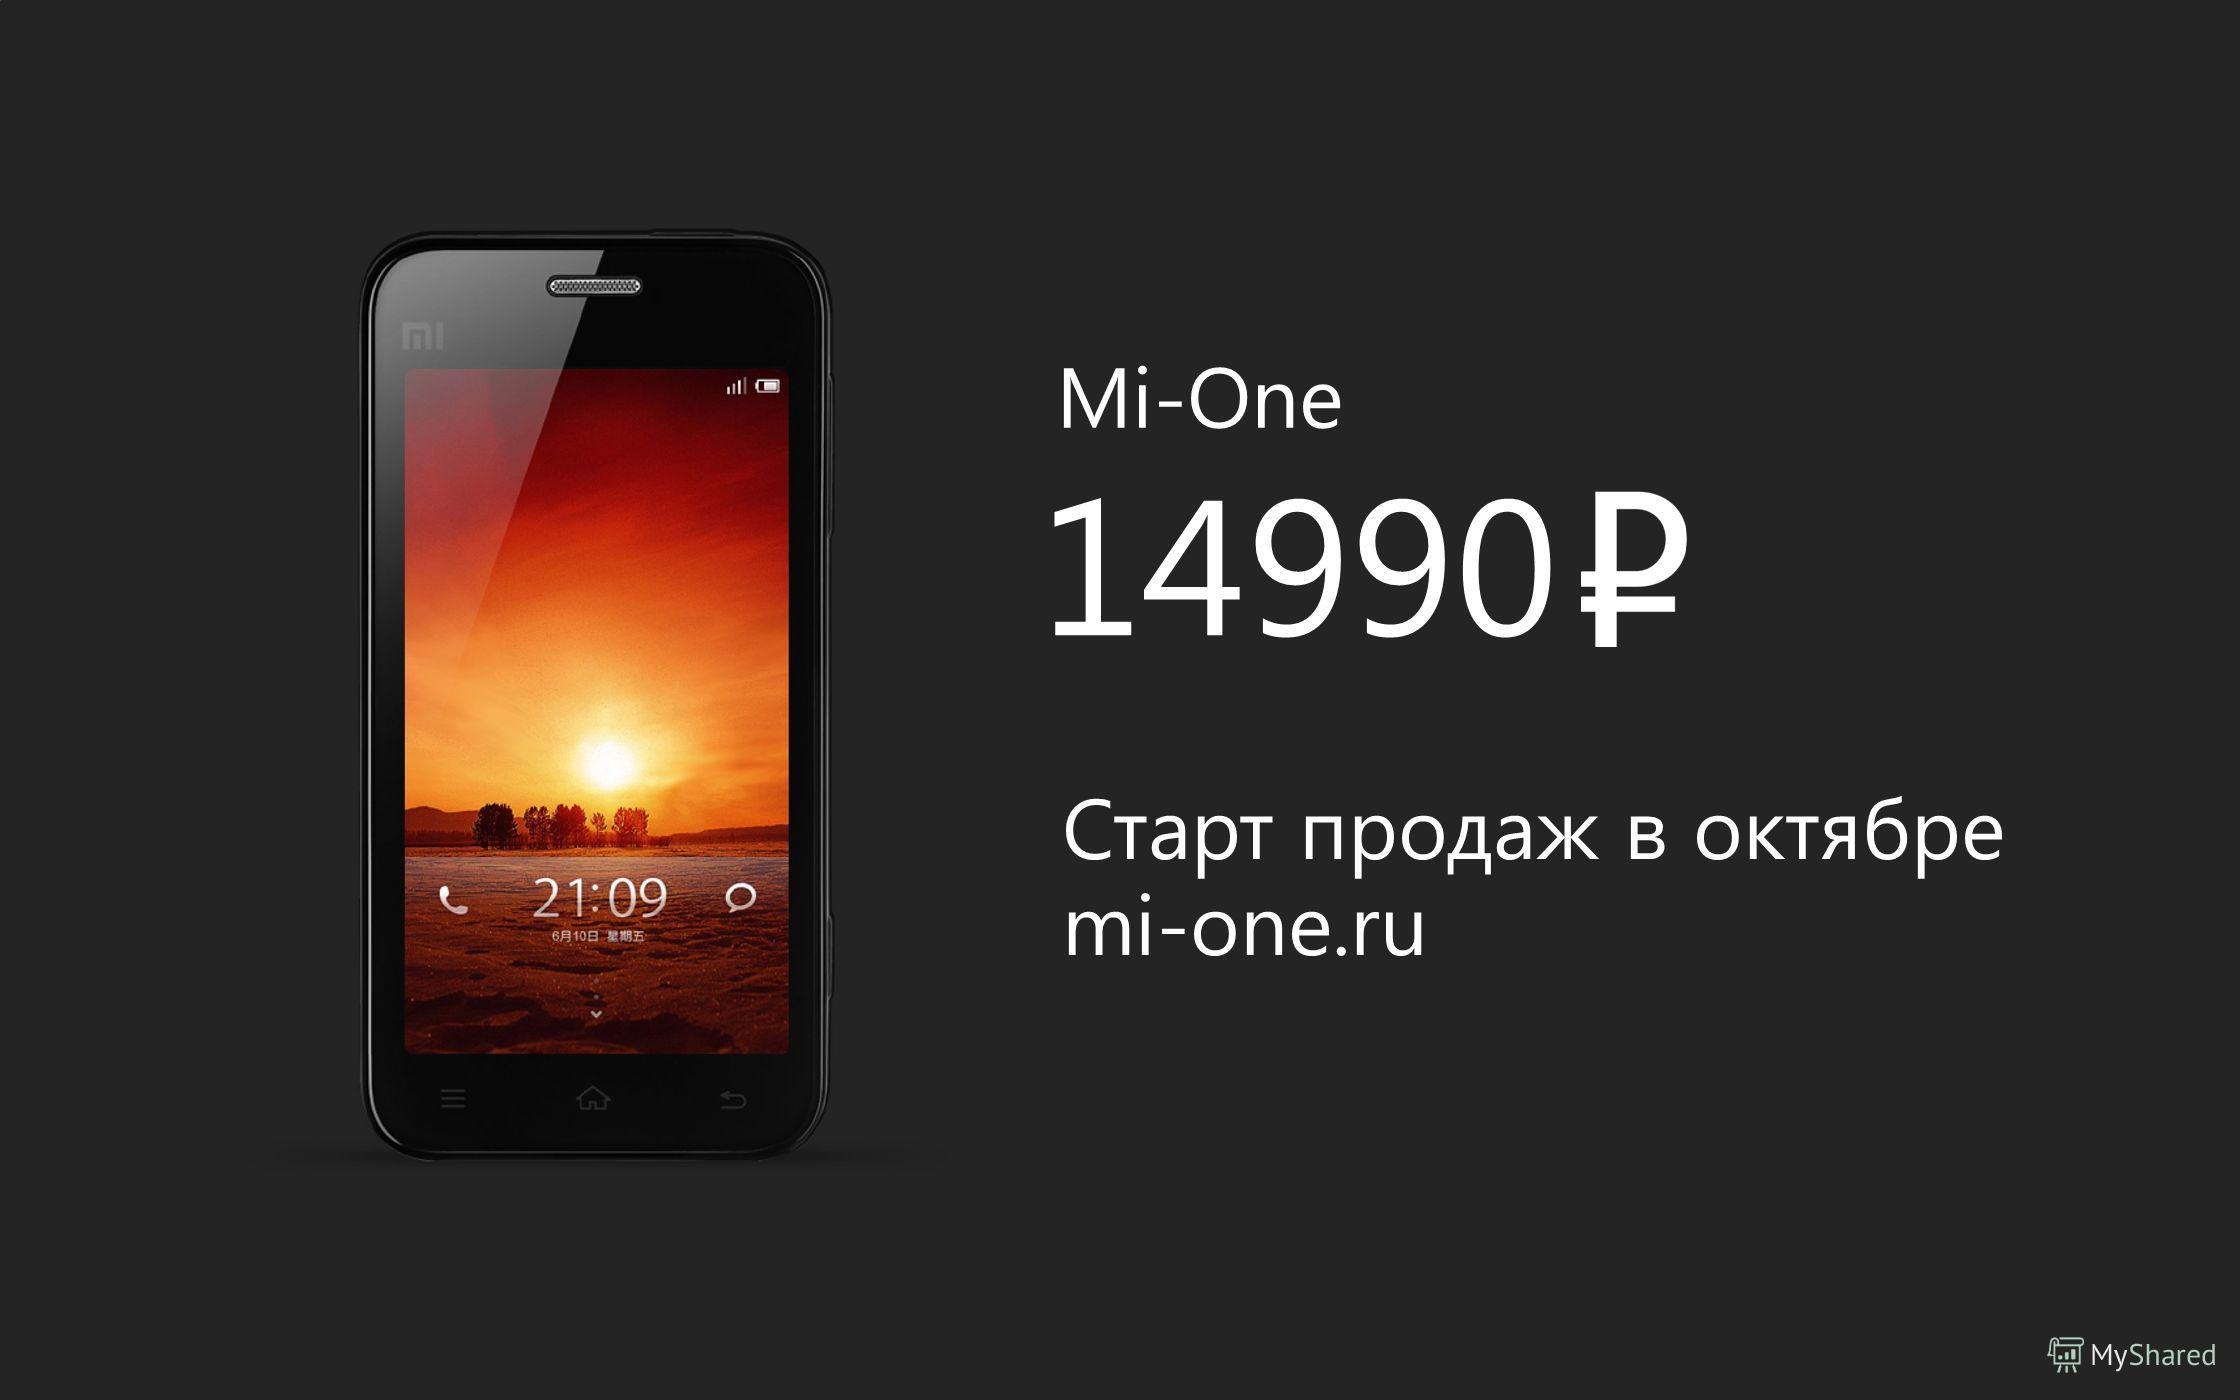 Mi-One 14990 Старт продаж в октябре mi-one.ru